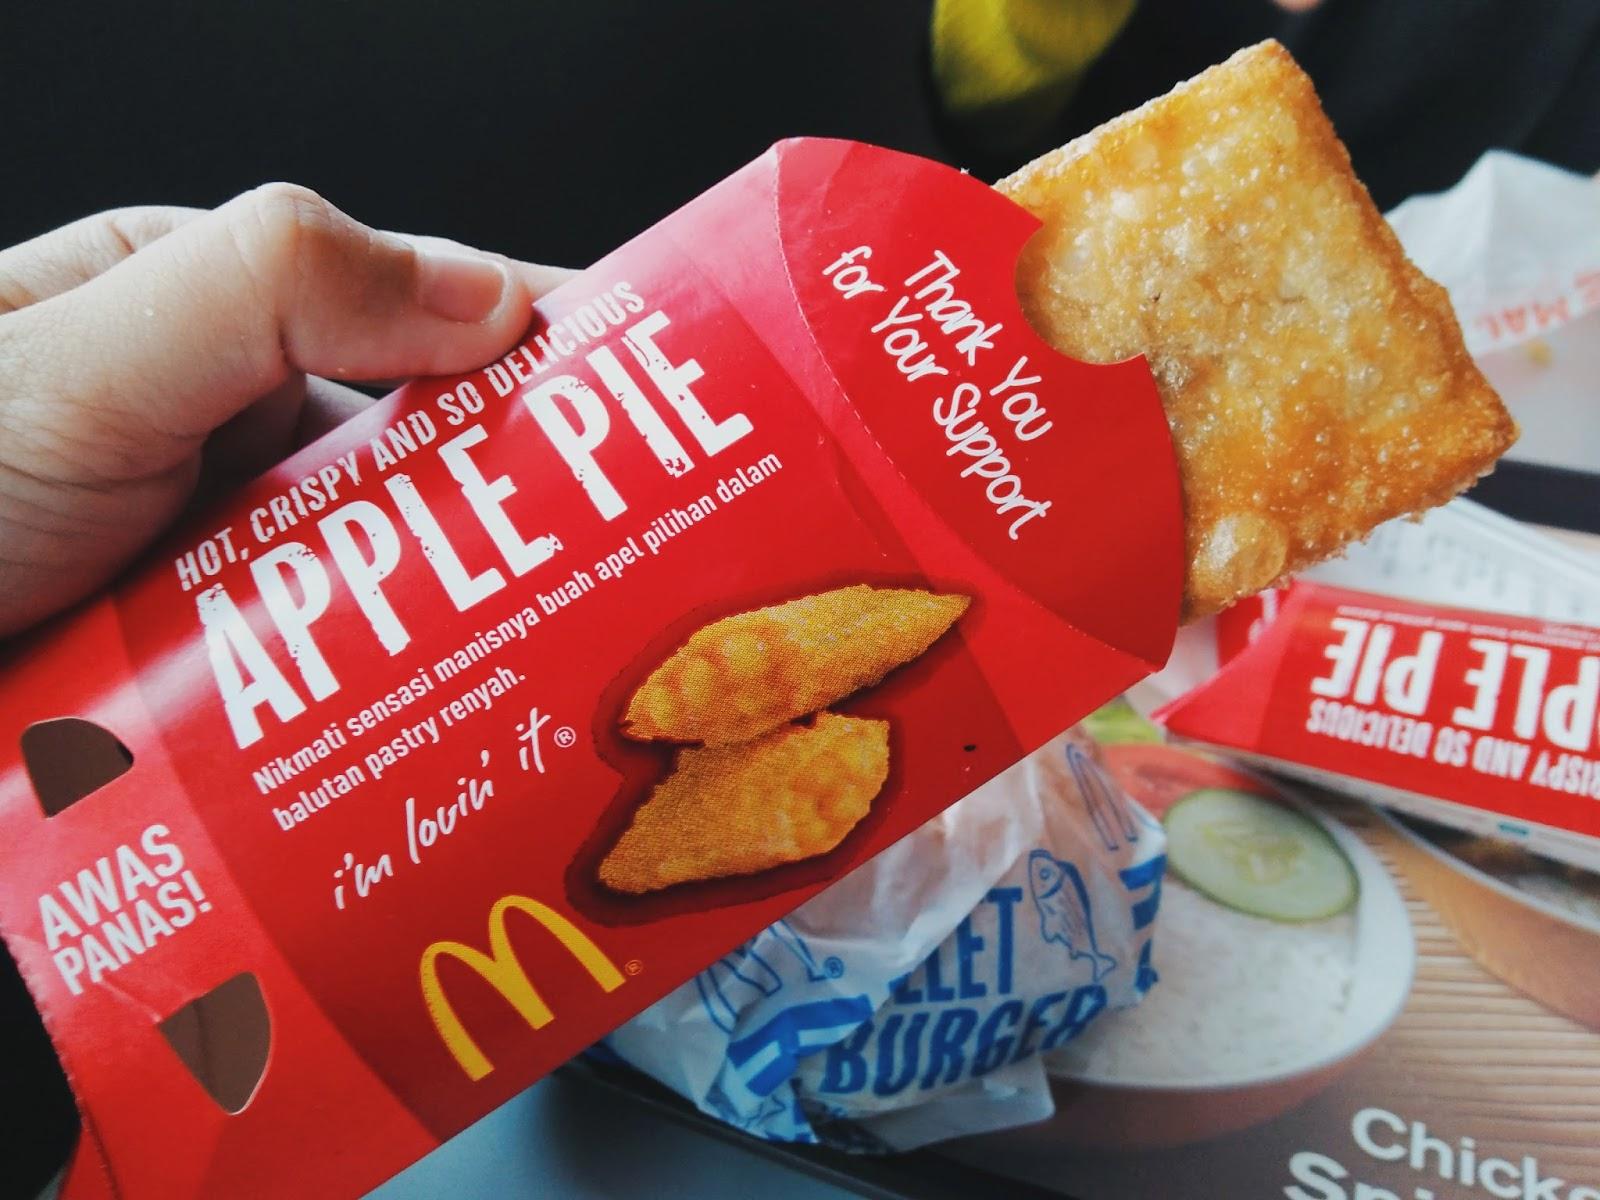 Apple Pie Mcdonald's Indonesia - Mcdonald's Indonesia Apple Pie